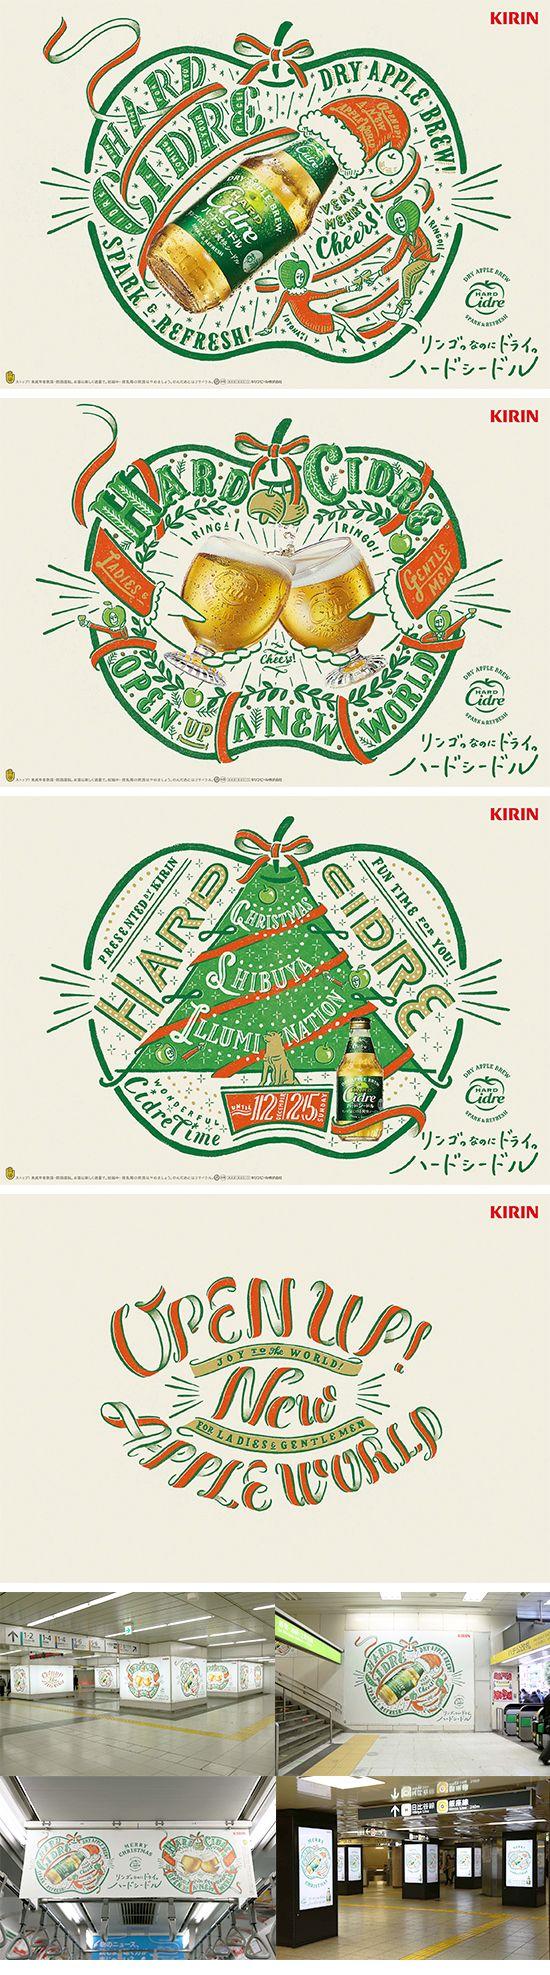 Creative Power Unit » Blog Archive » KIRIN HARD Cidre 2016 Xmas